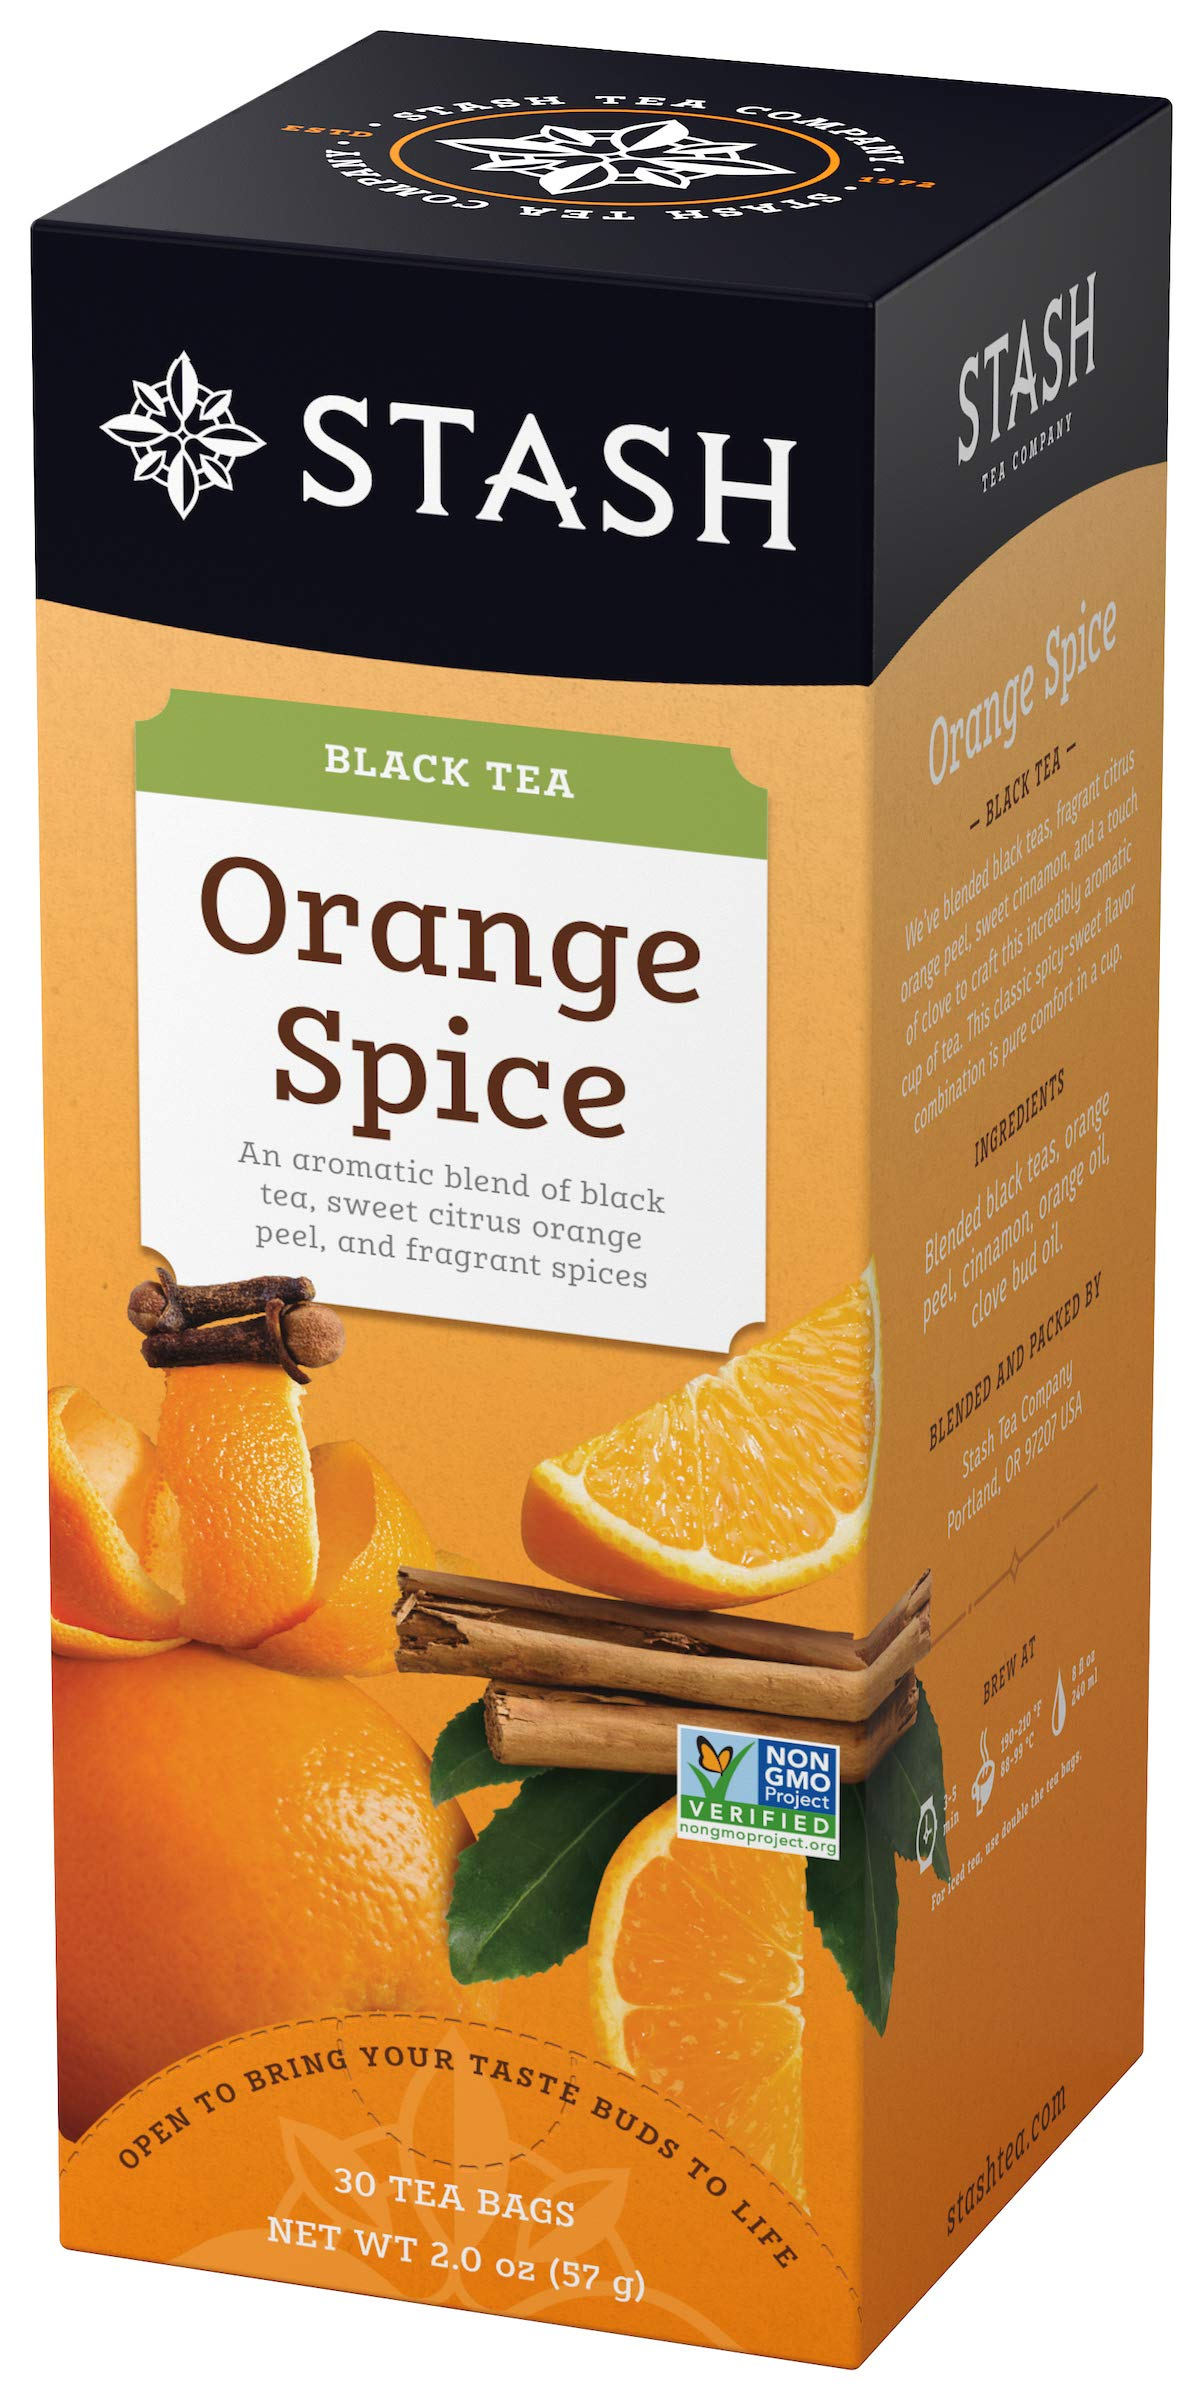 Stash Tea Orange Spice Black Tea 30 Count Tea Bags in Foil (Pack of 6) Individual Black Tea Bags for Use in Teapots Mugs or Cups, Brew Hot Tea or Iced Tea